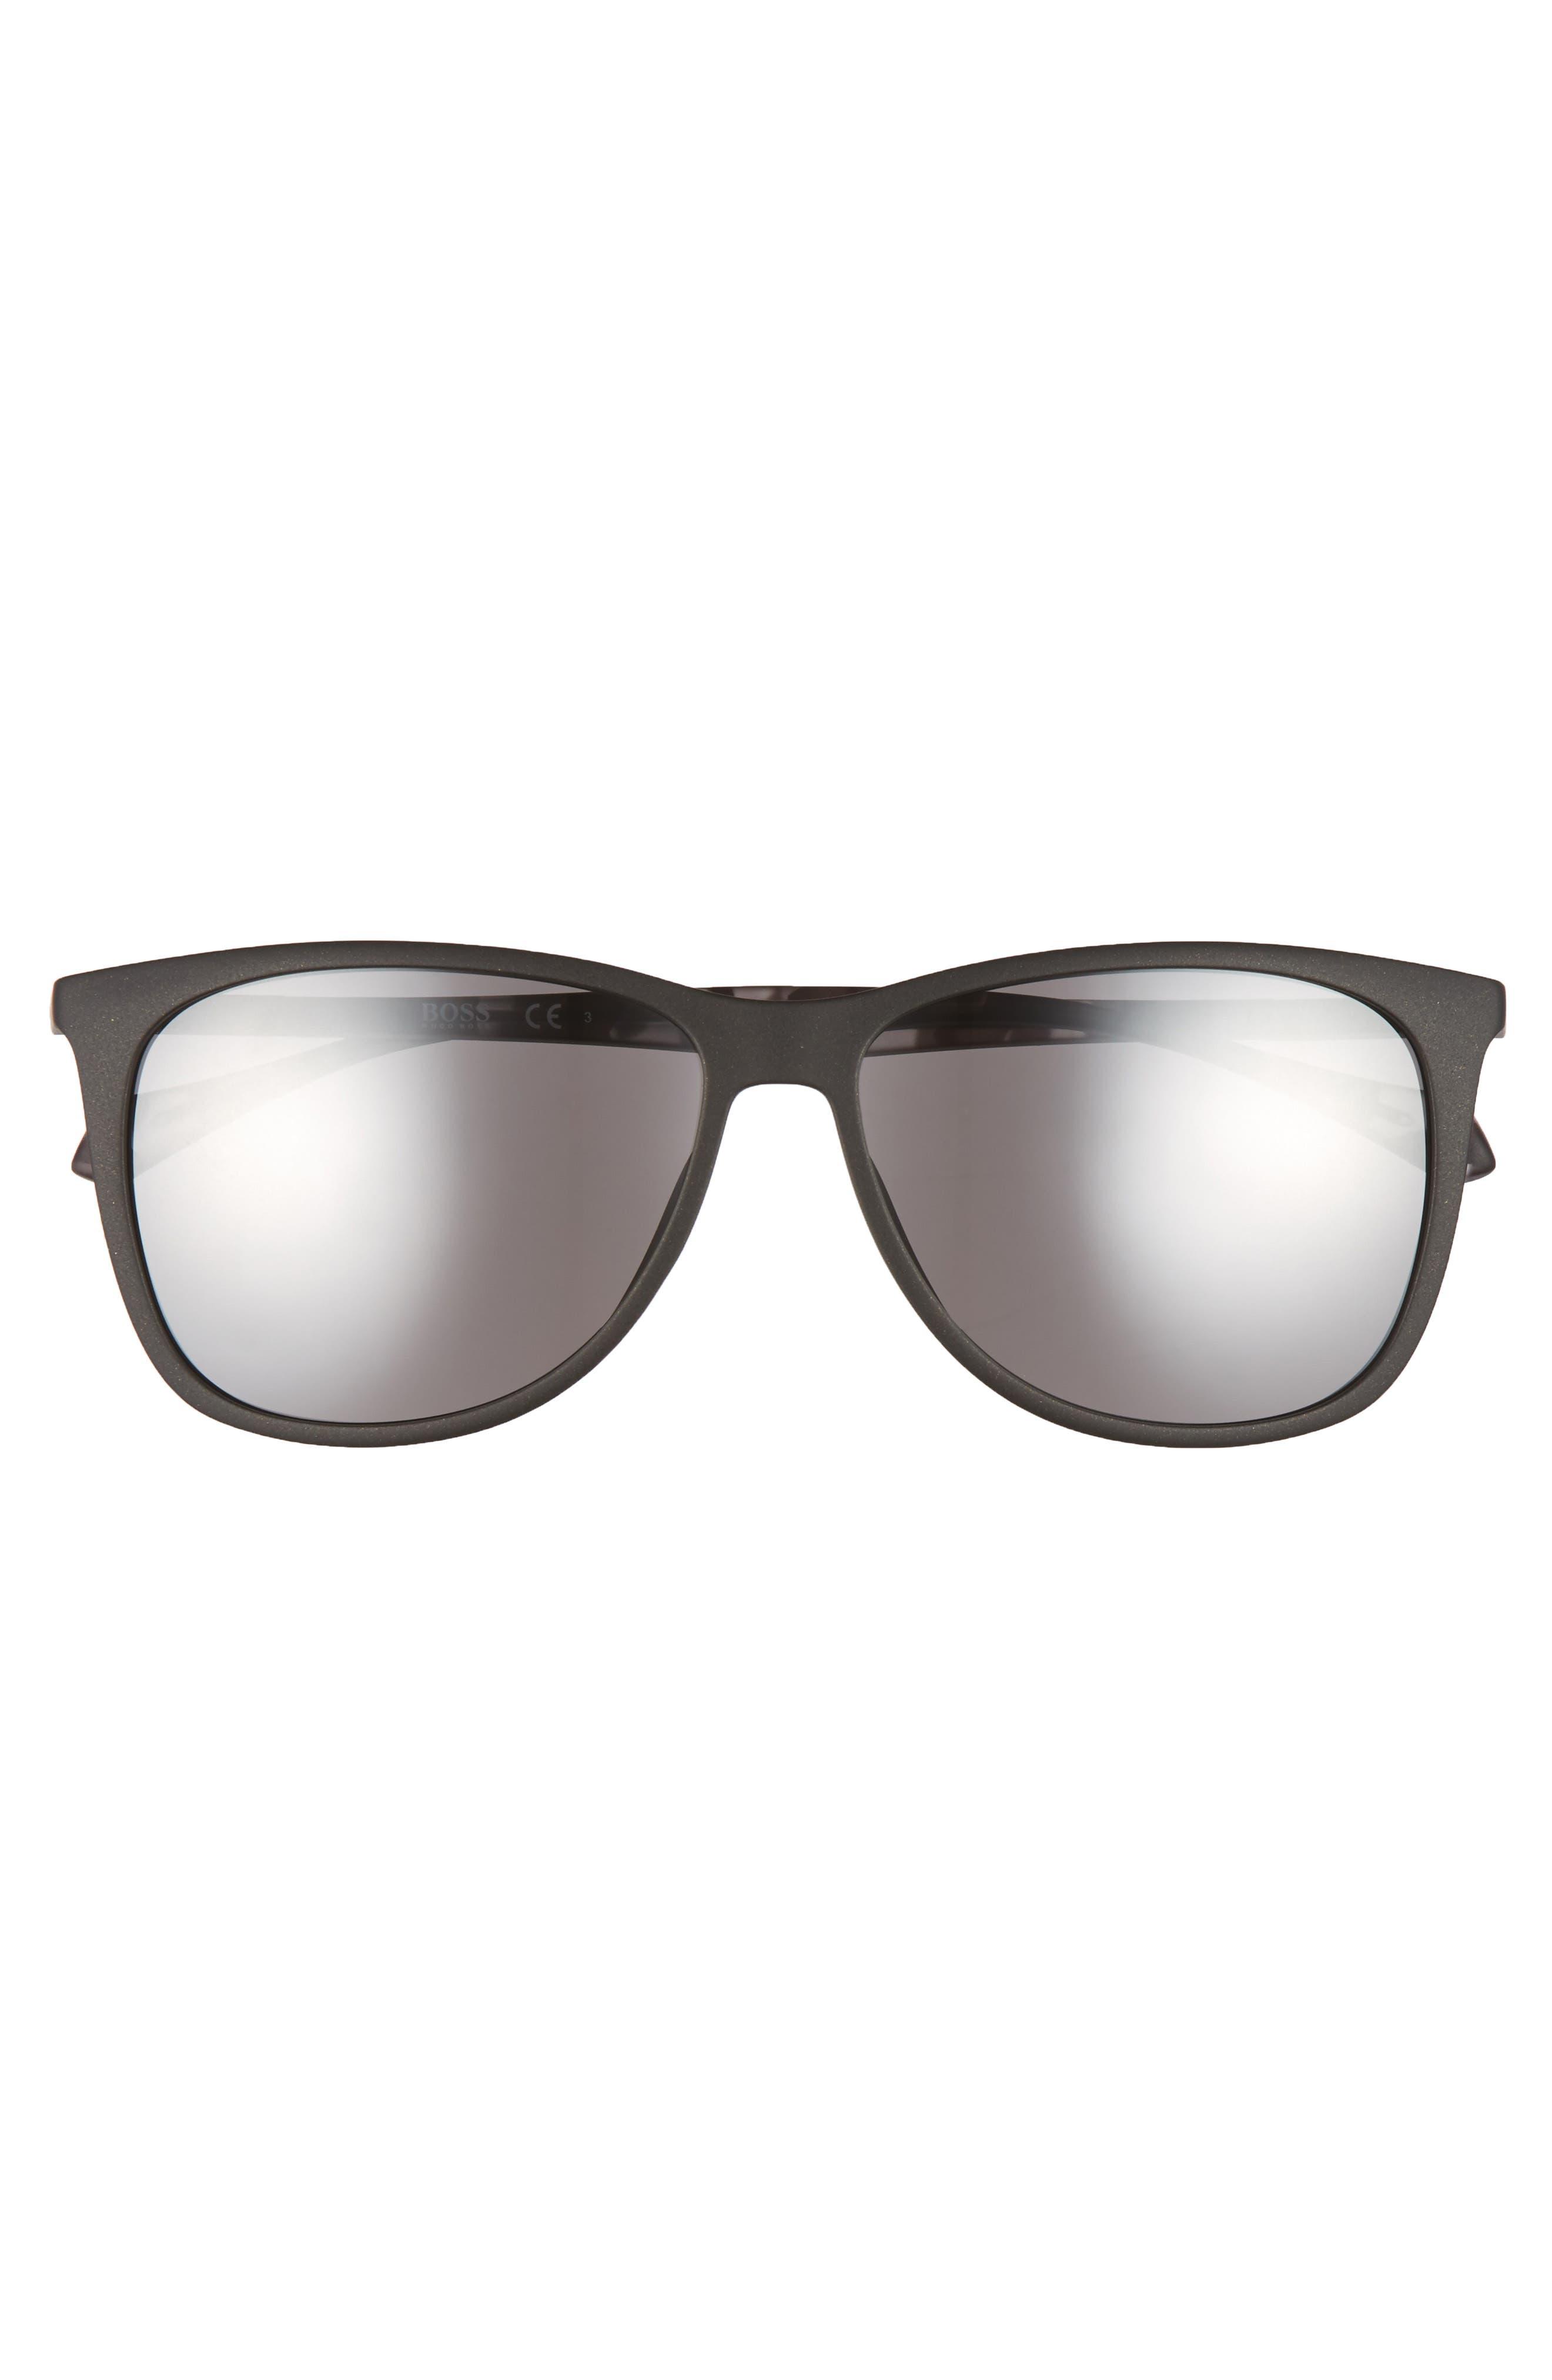 58mm Sunglasses,                             Alternate thumbnail 2, color,                             002